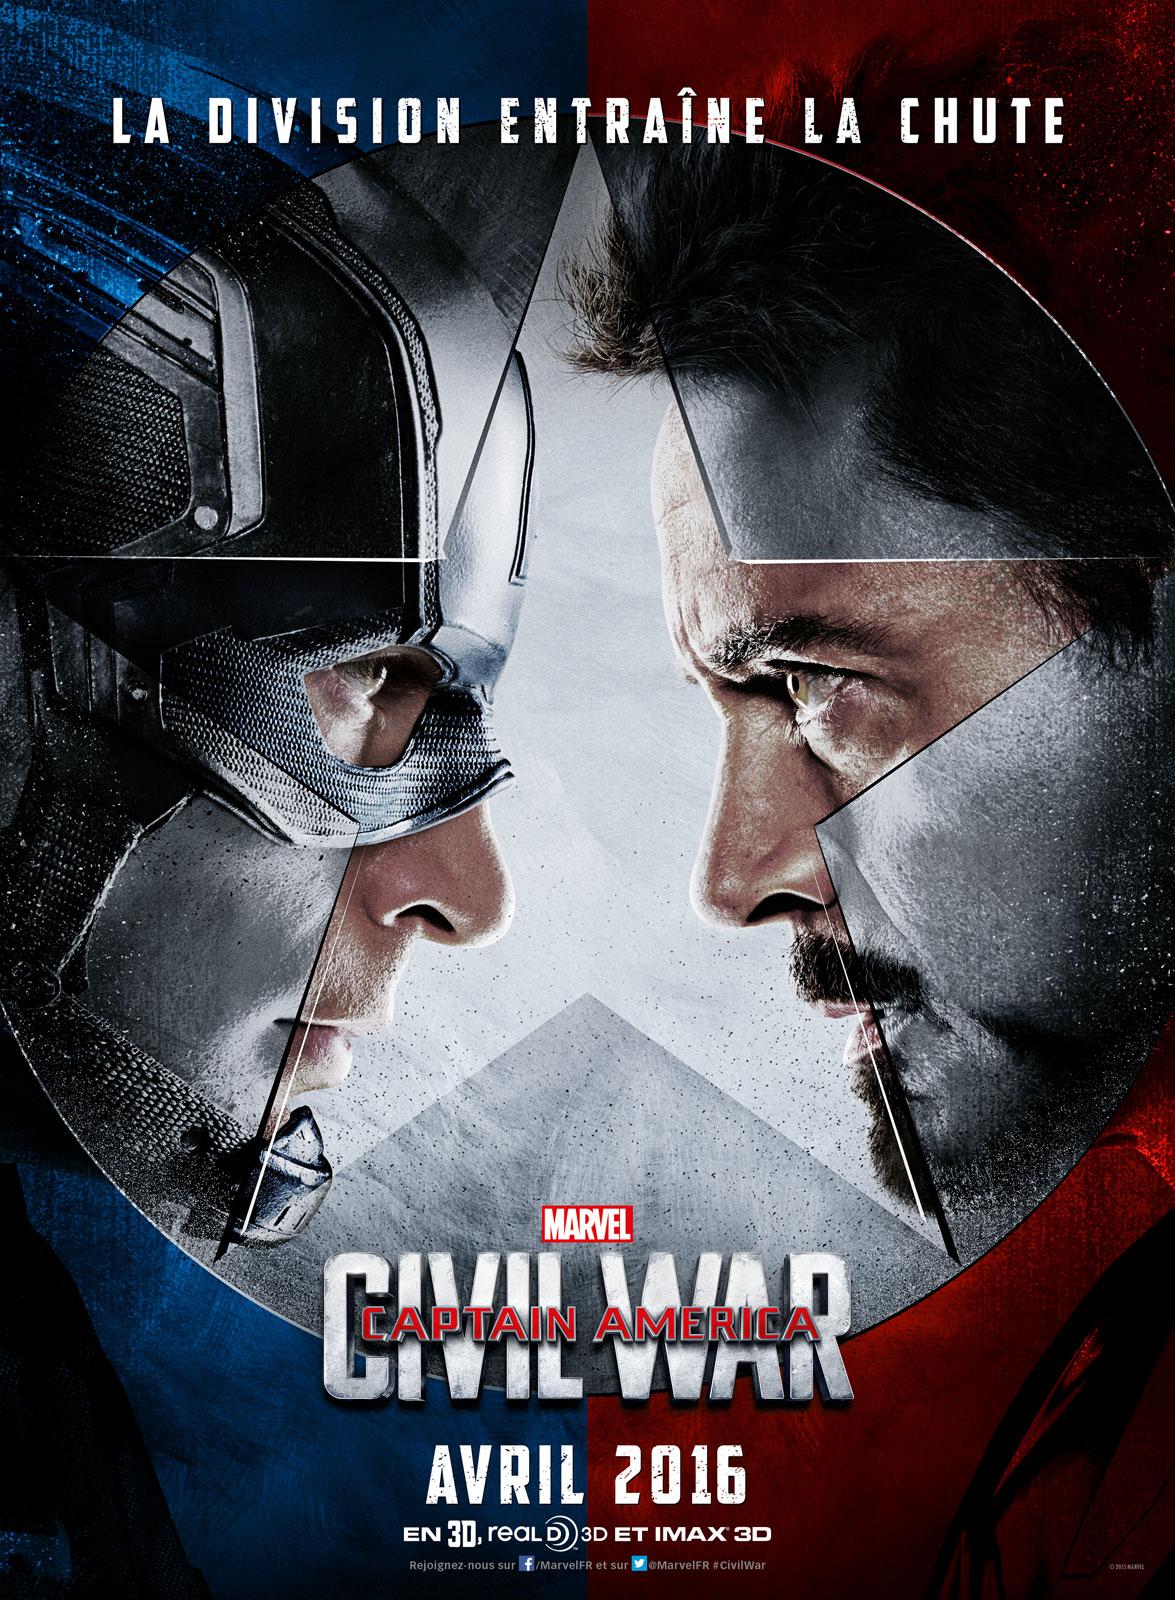 disney marvel captain america civil war affiche poster